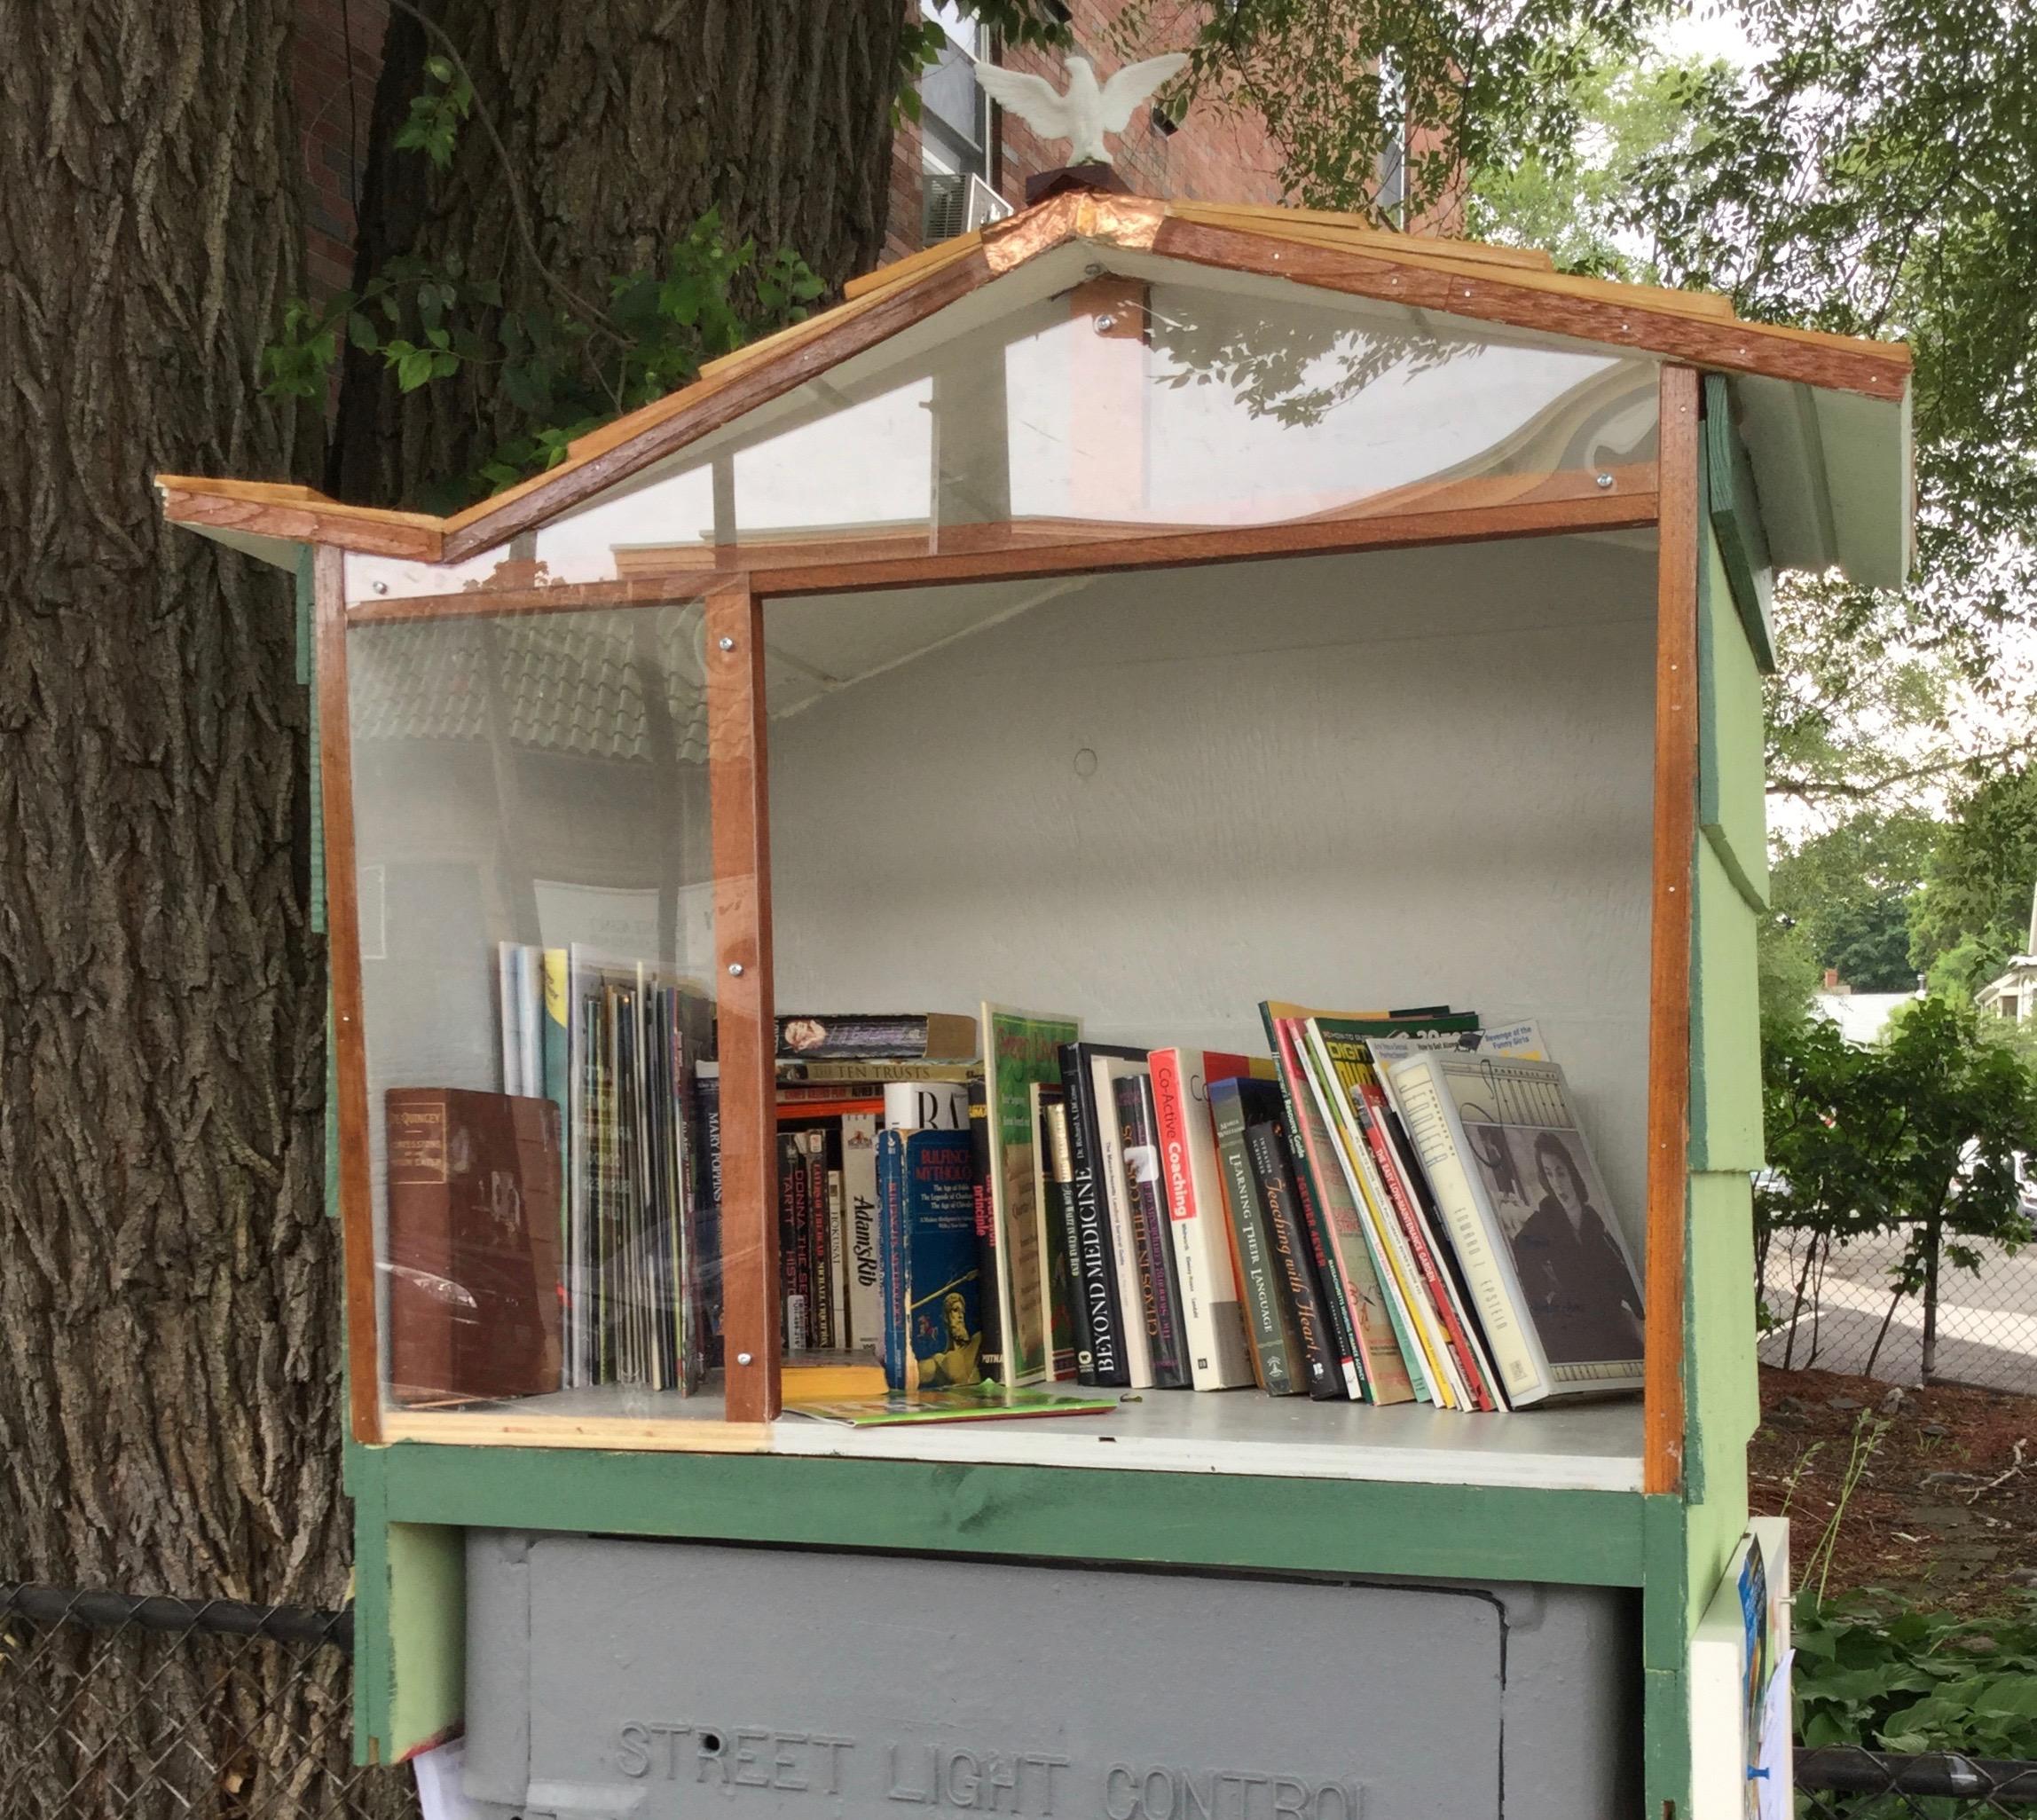 Book_hutch_front.jpg